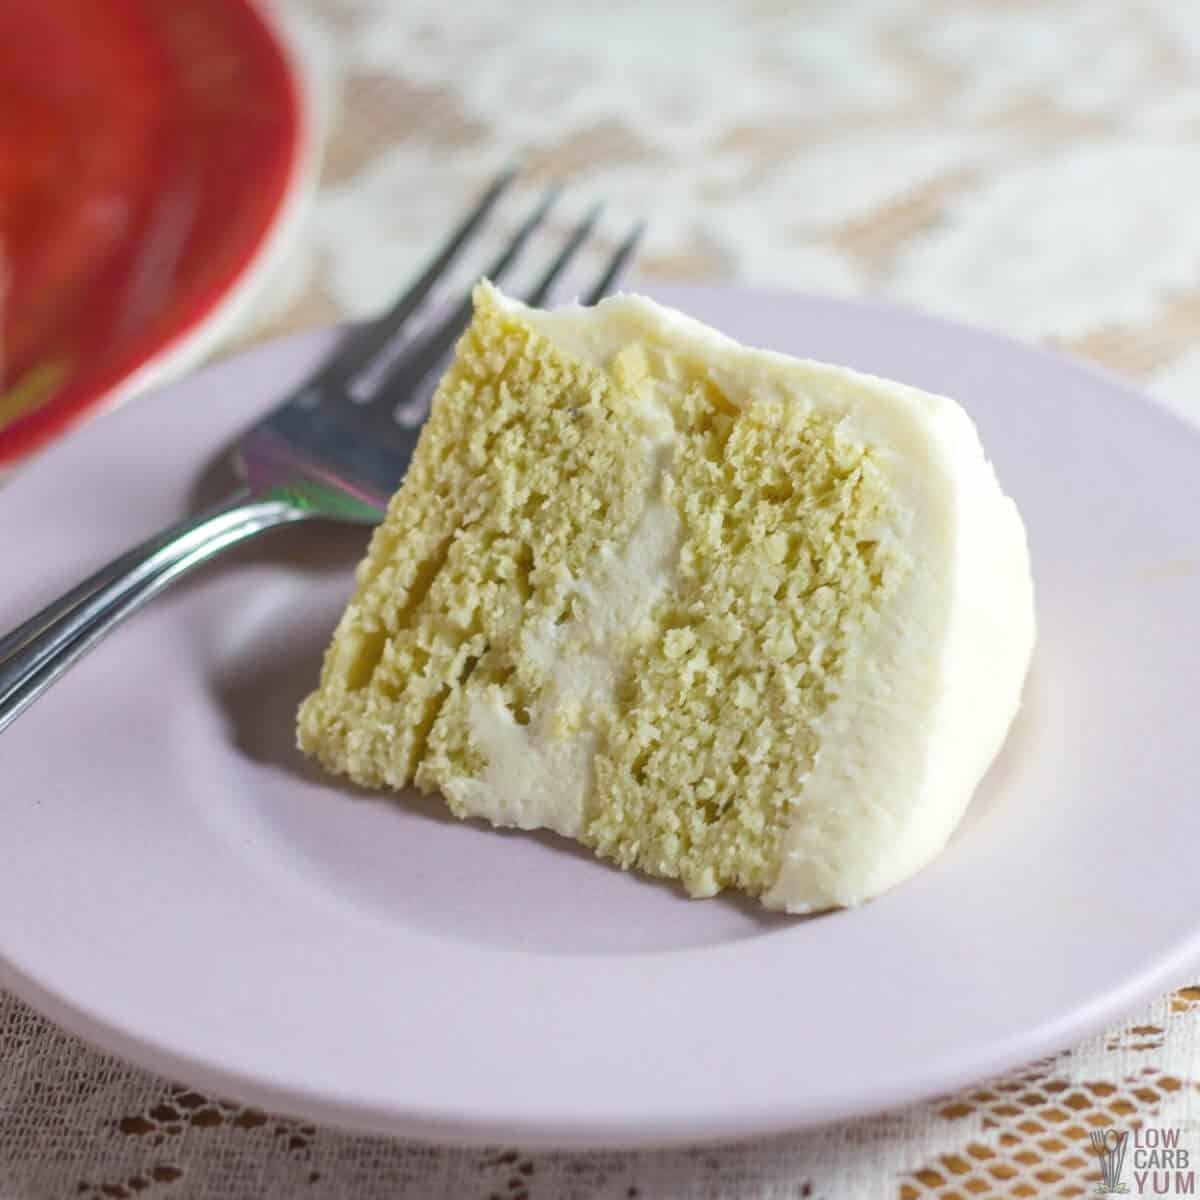 slice of keto birthday cake on lavender plate